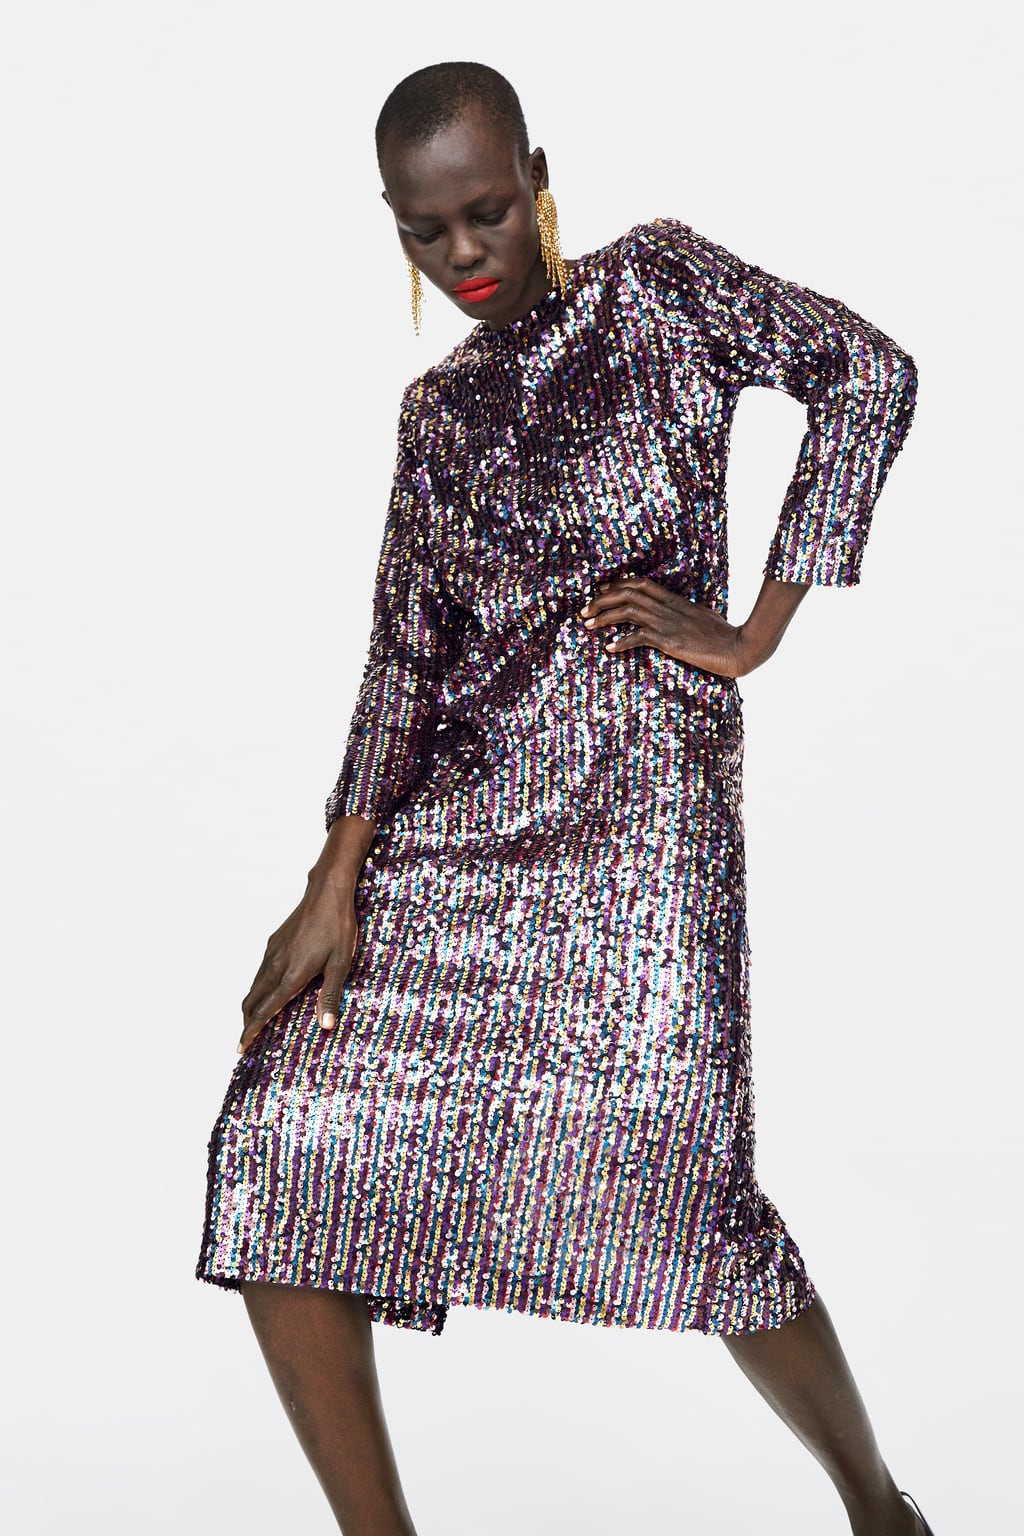 ad9f7915b63d Τρία υπέροχα party dresses απο το Zara που θα λατρέψετε! - CityWoman